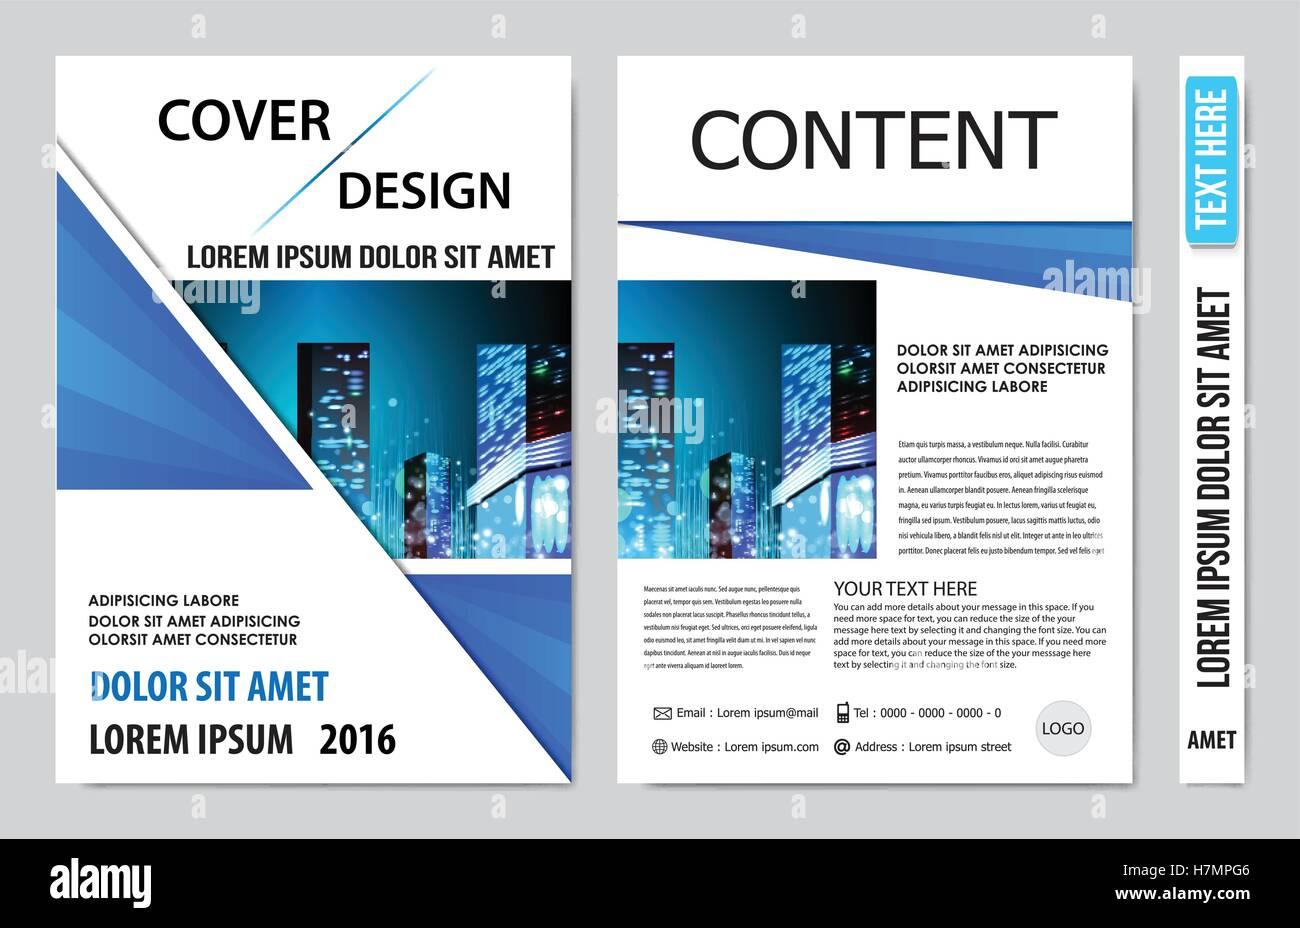 Cover book presentation design - Stock Image